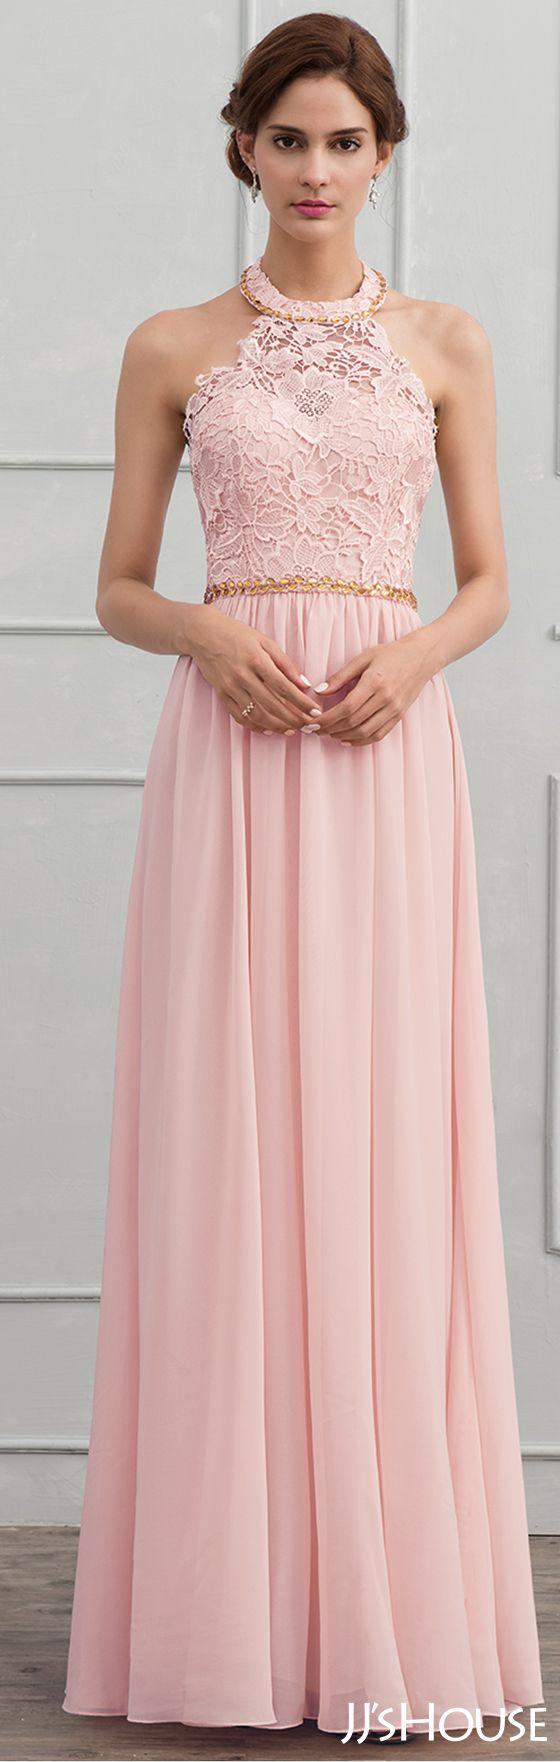 652 best vertido de festa images on Pinterest | Bridesmaid dress ...